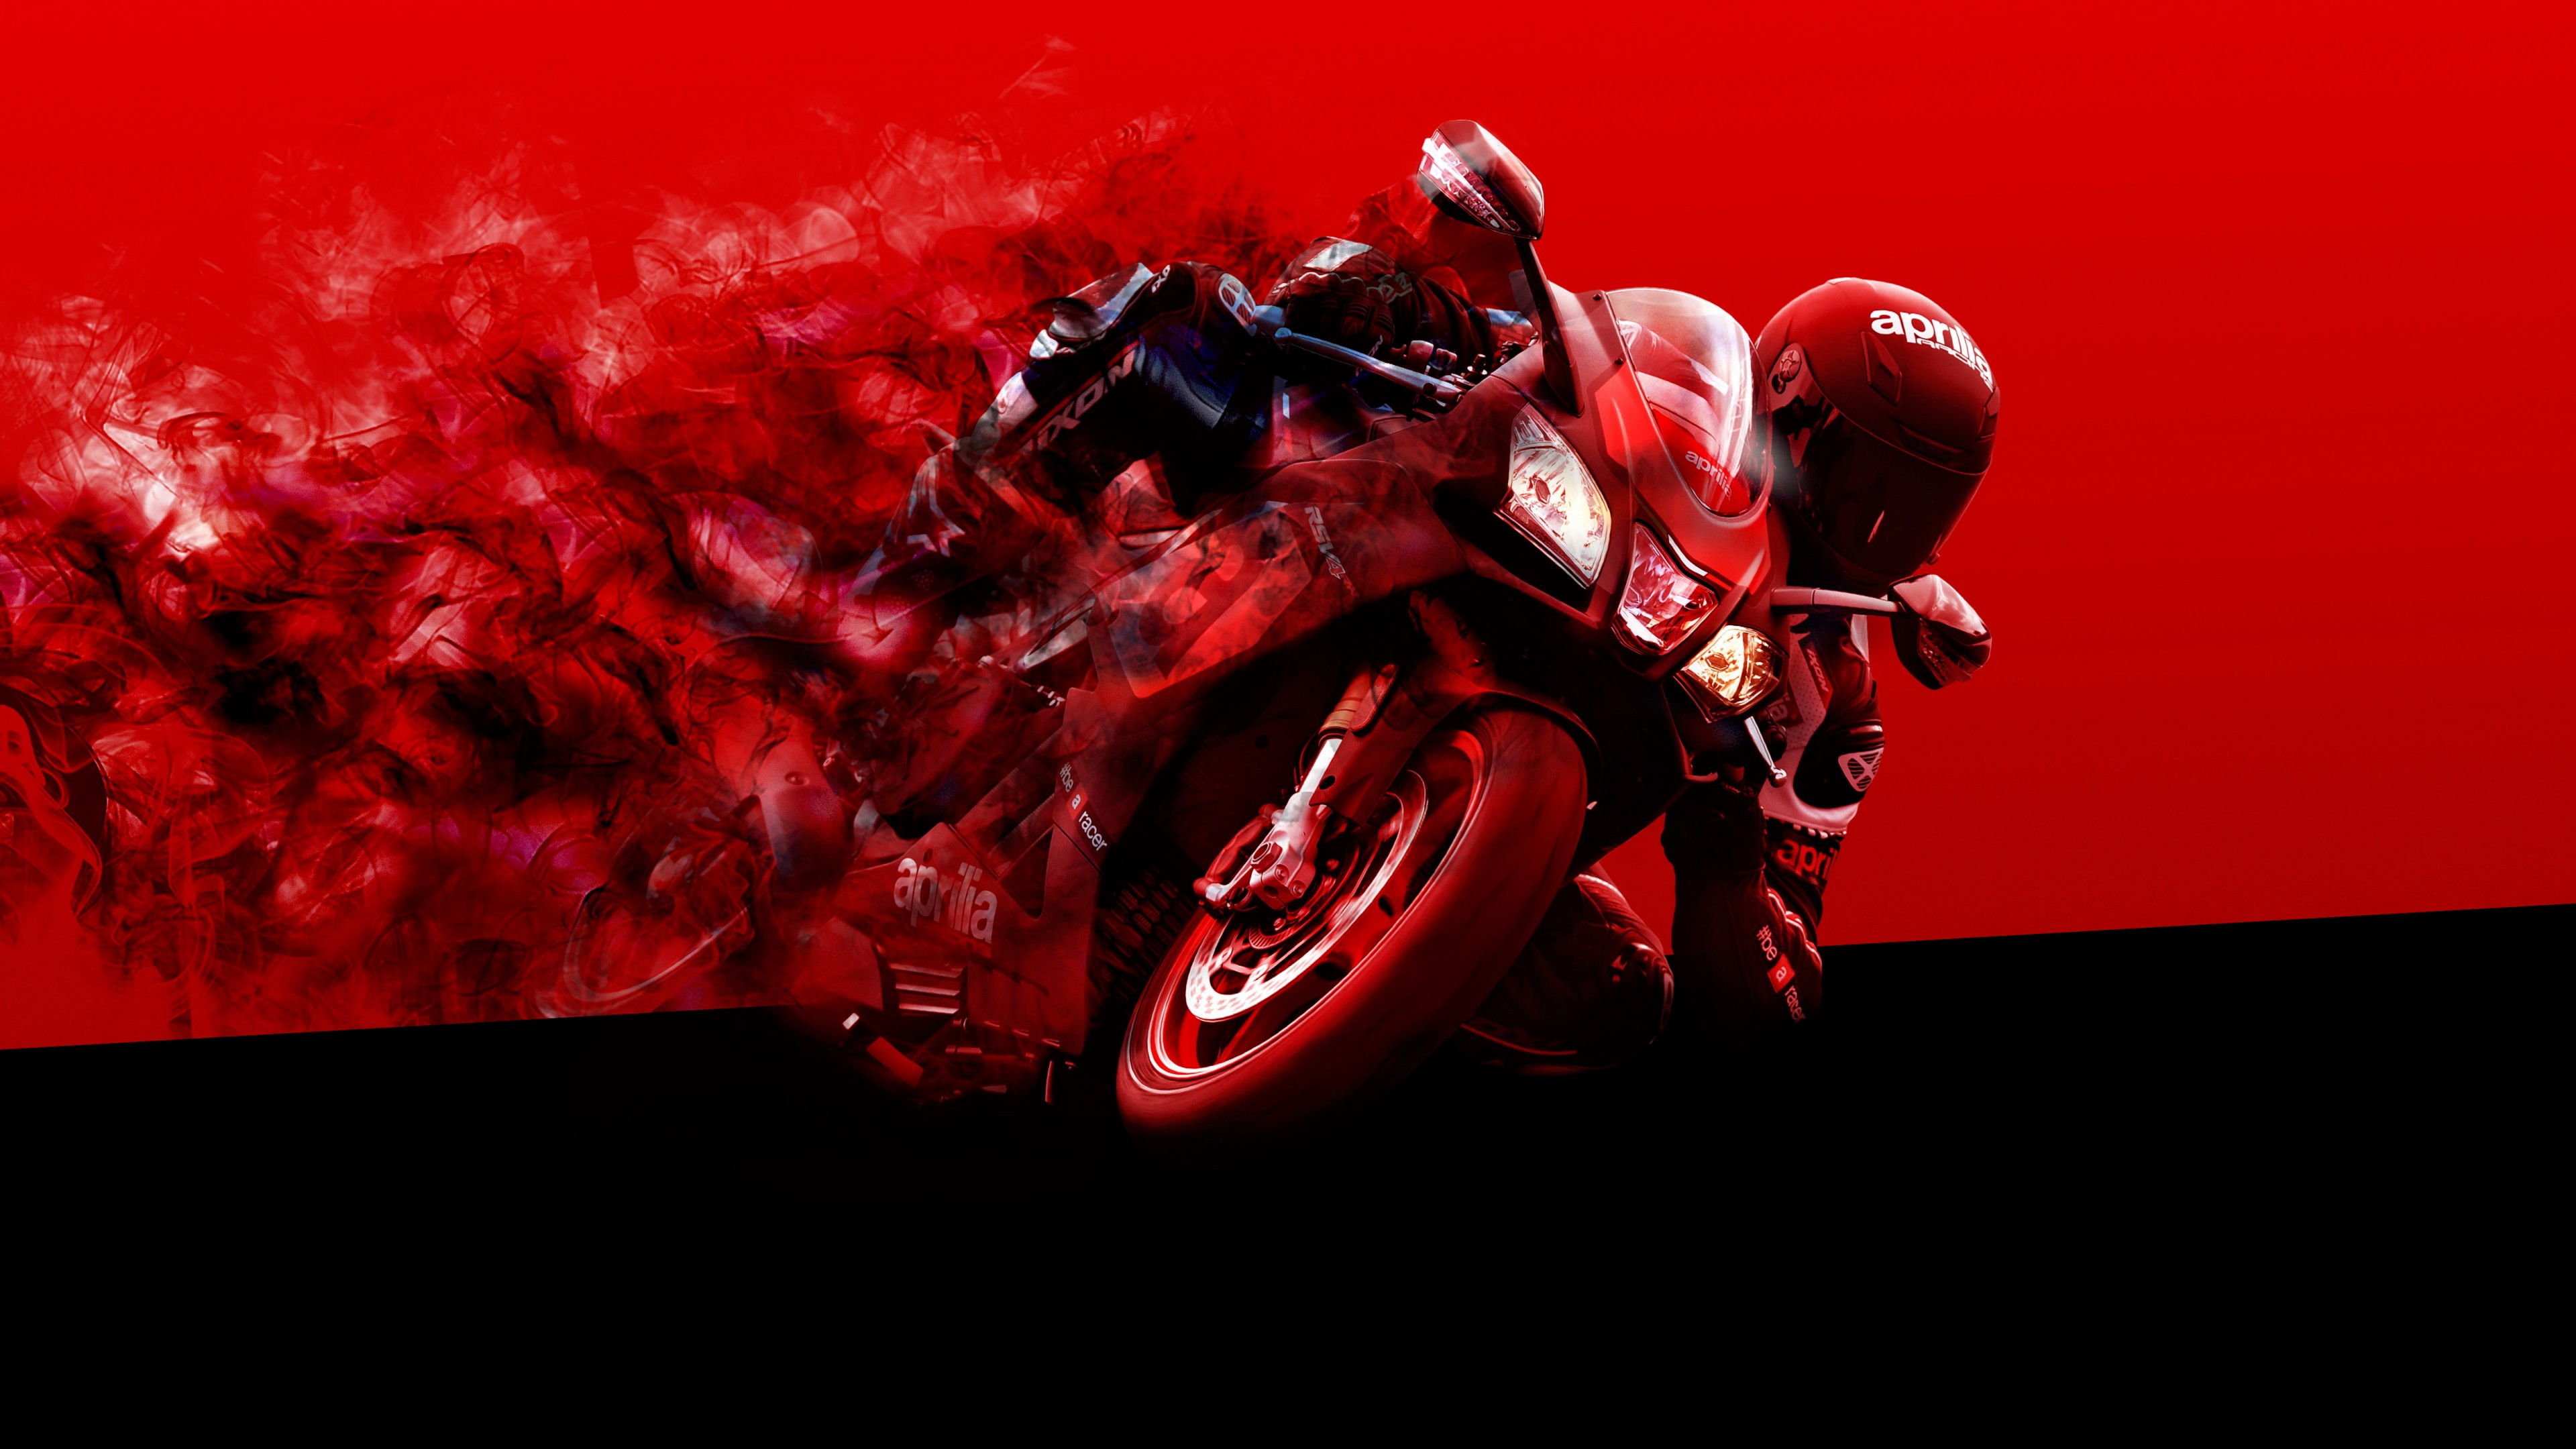 Мотокросс на красном мотоцикле